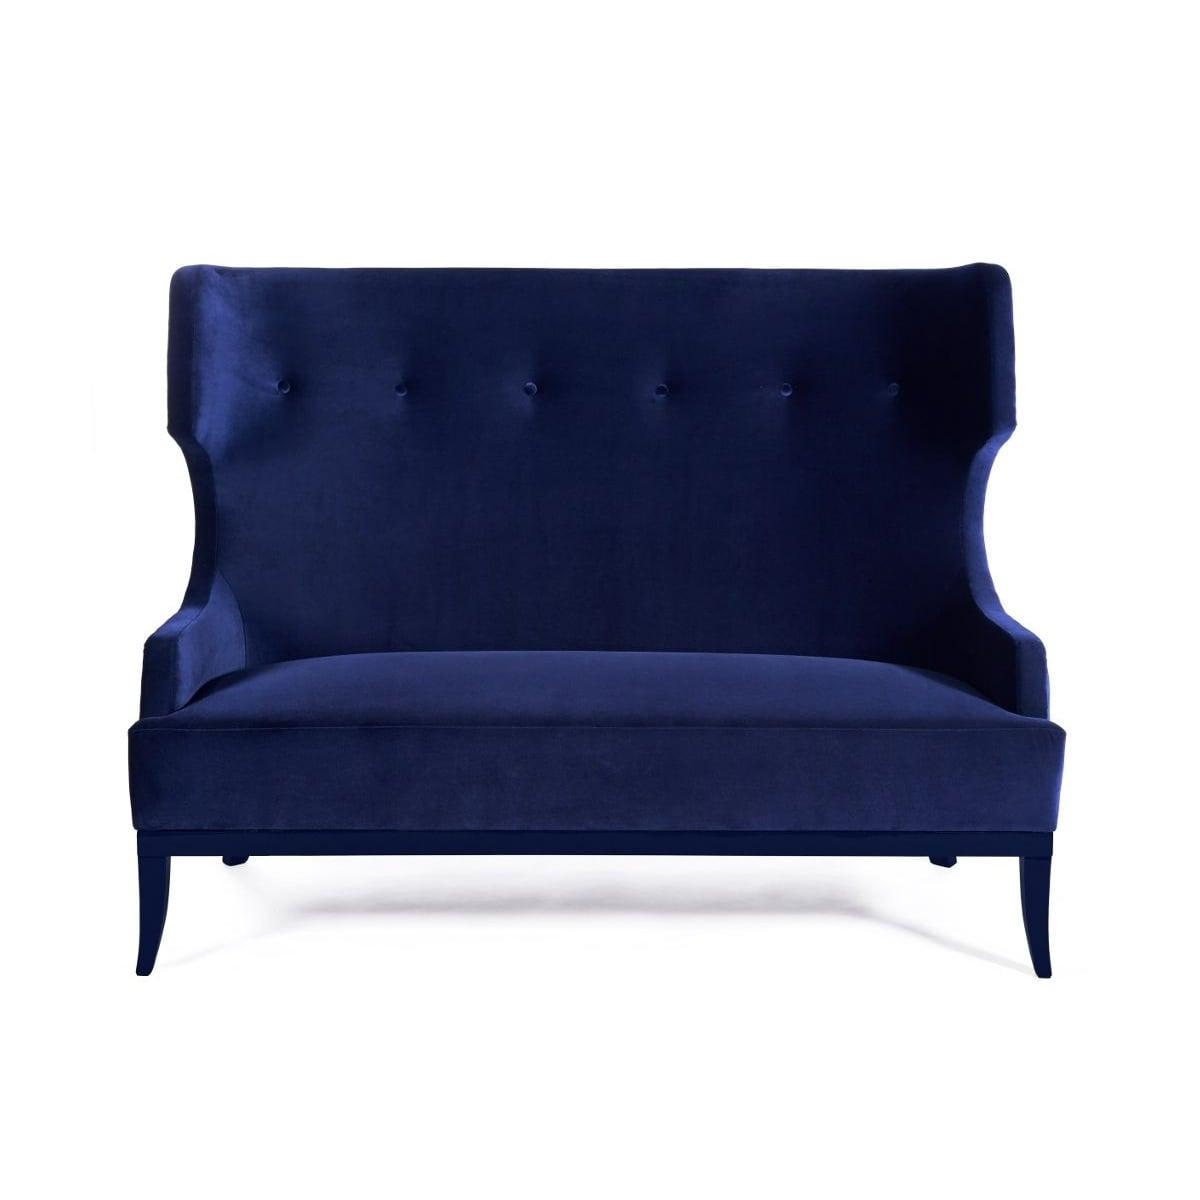 2 seat sofa blue designer furniture swanky interiors for Trendy furniture